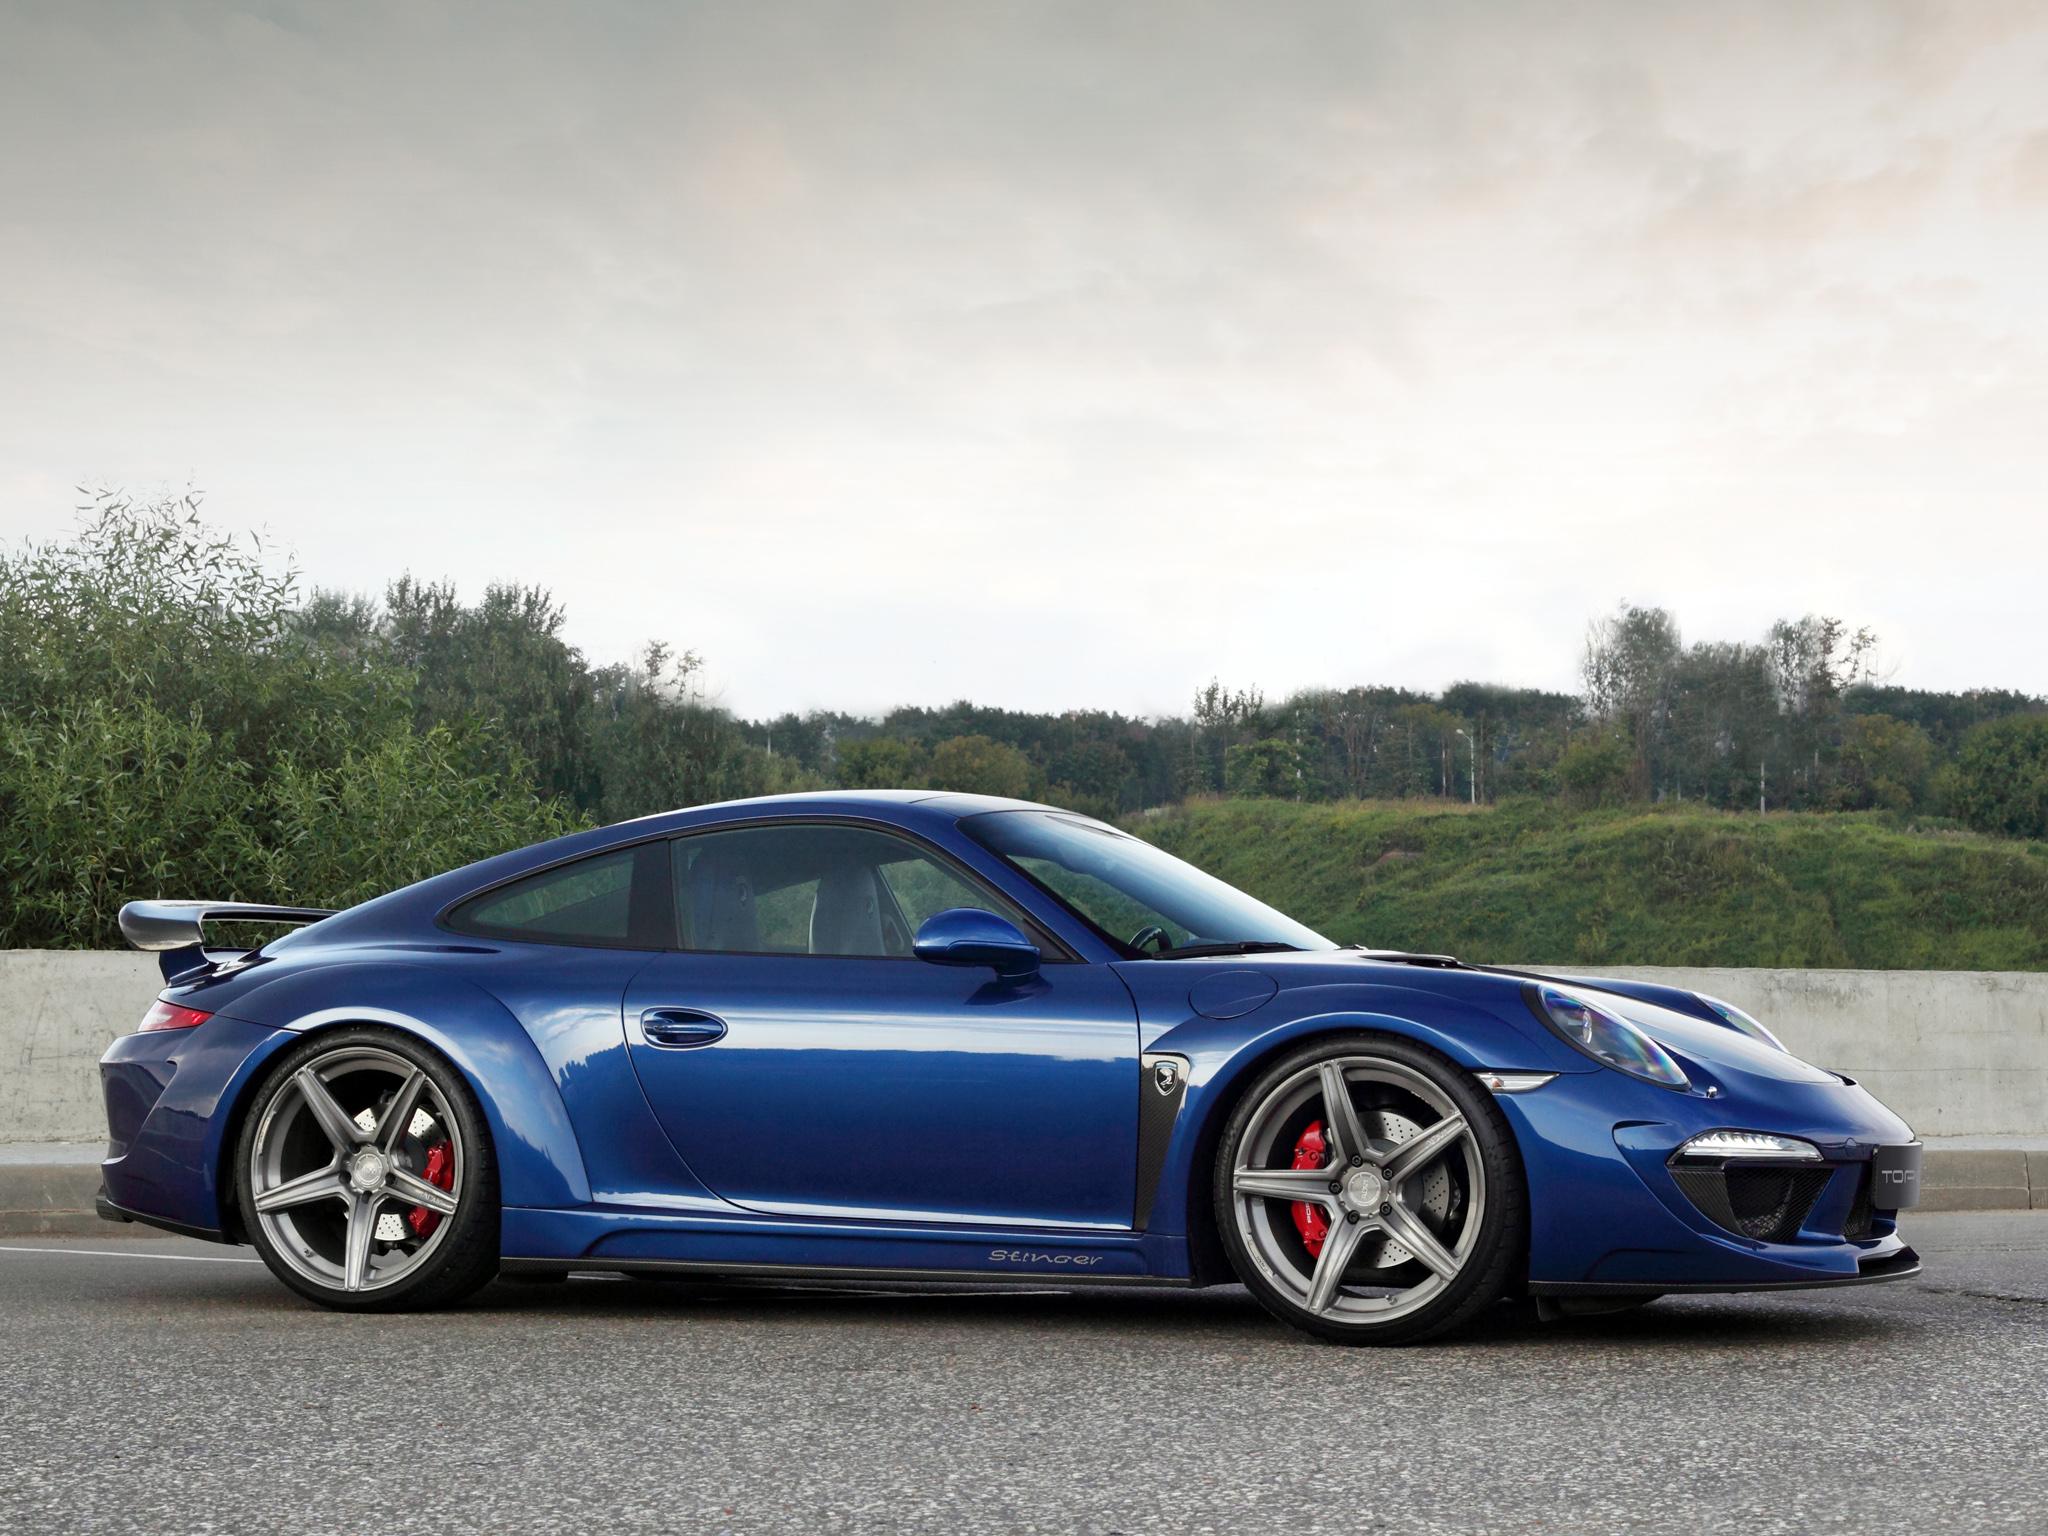 2013 Topcar Porsche 911 Carrera Stinger 991 Tuning